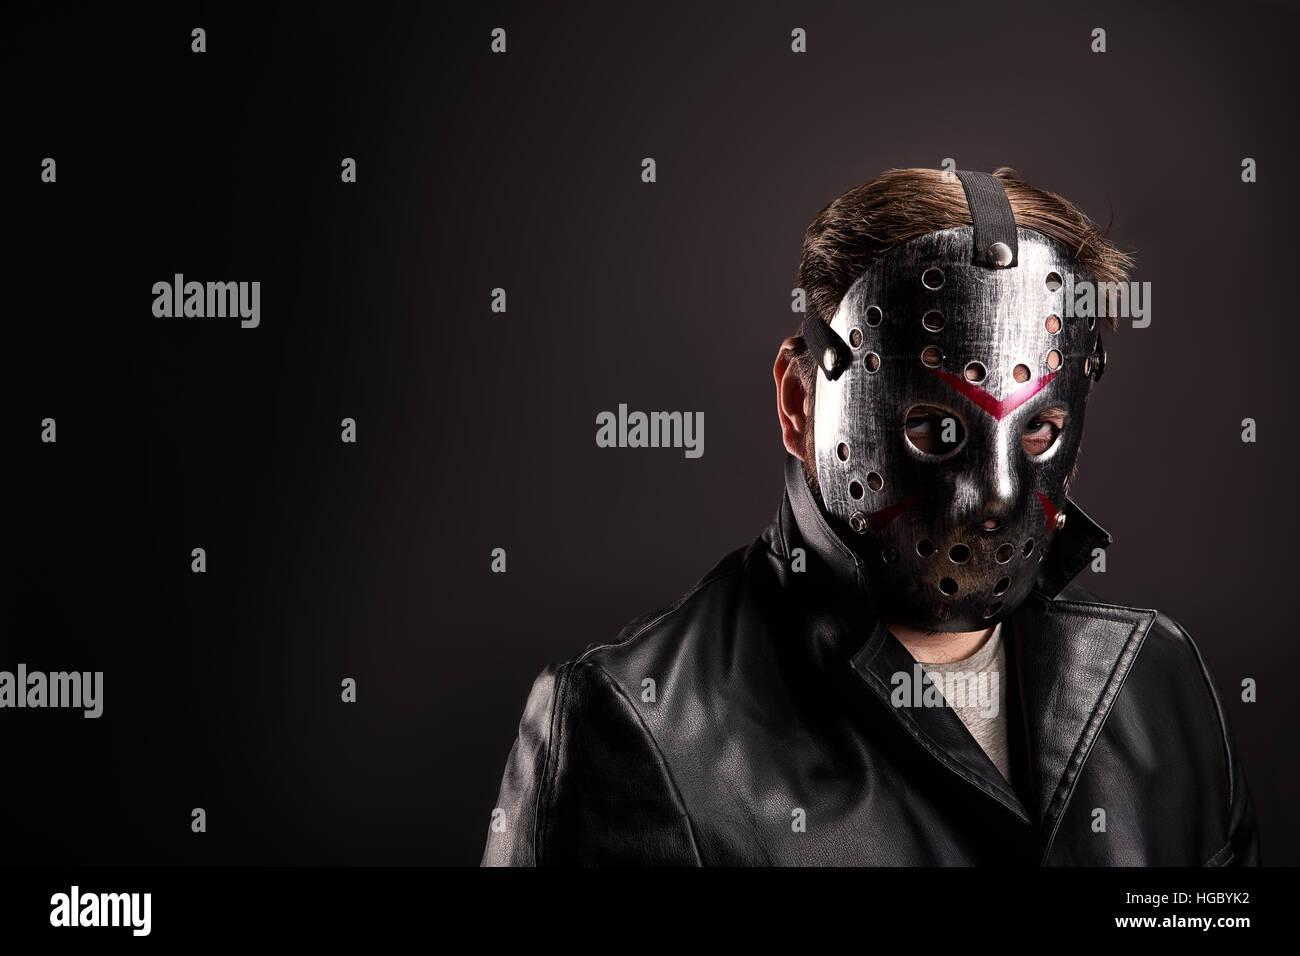 Bloody murderer in hockey mask portrait - Stock Image